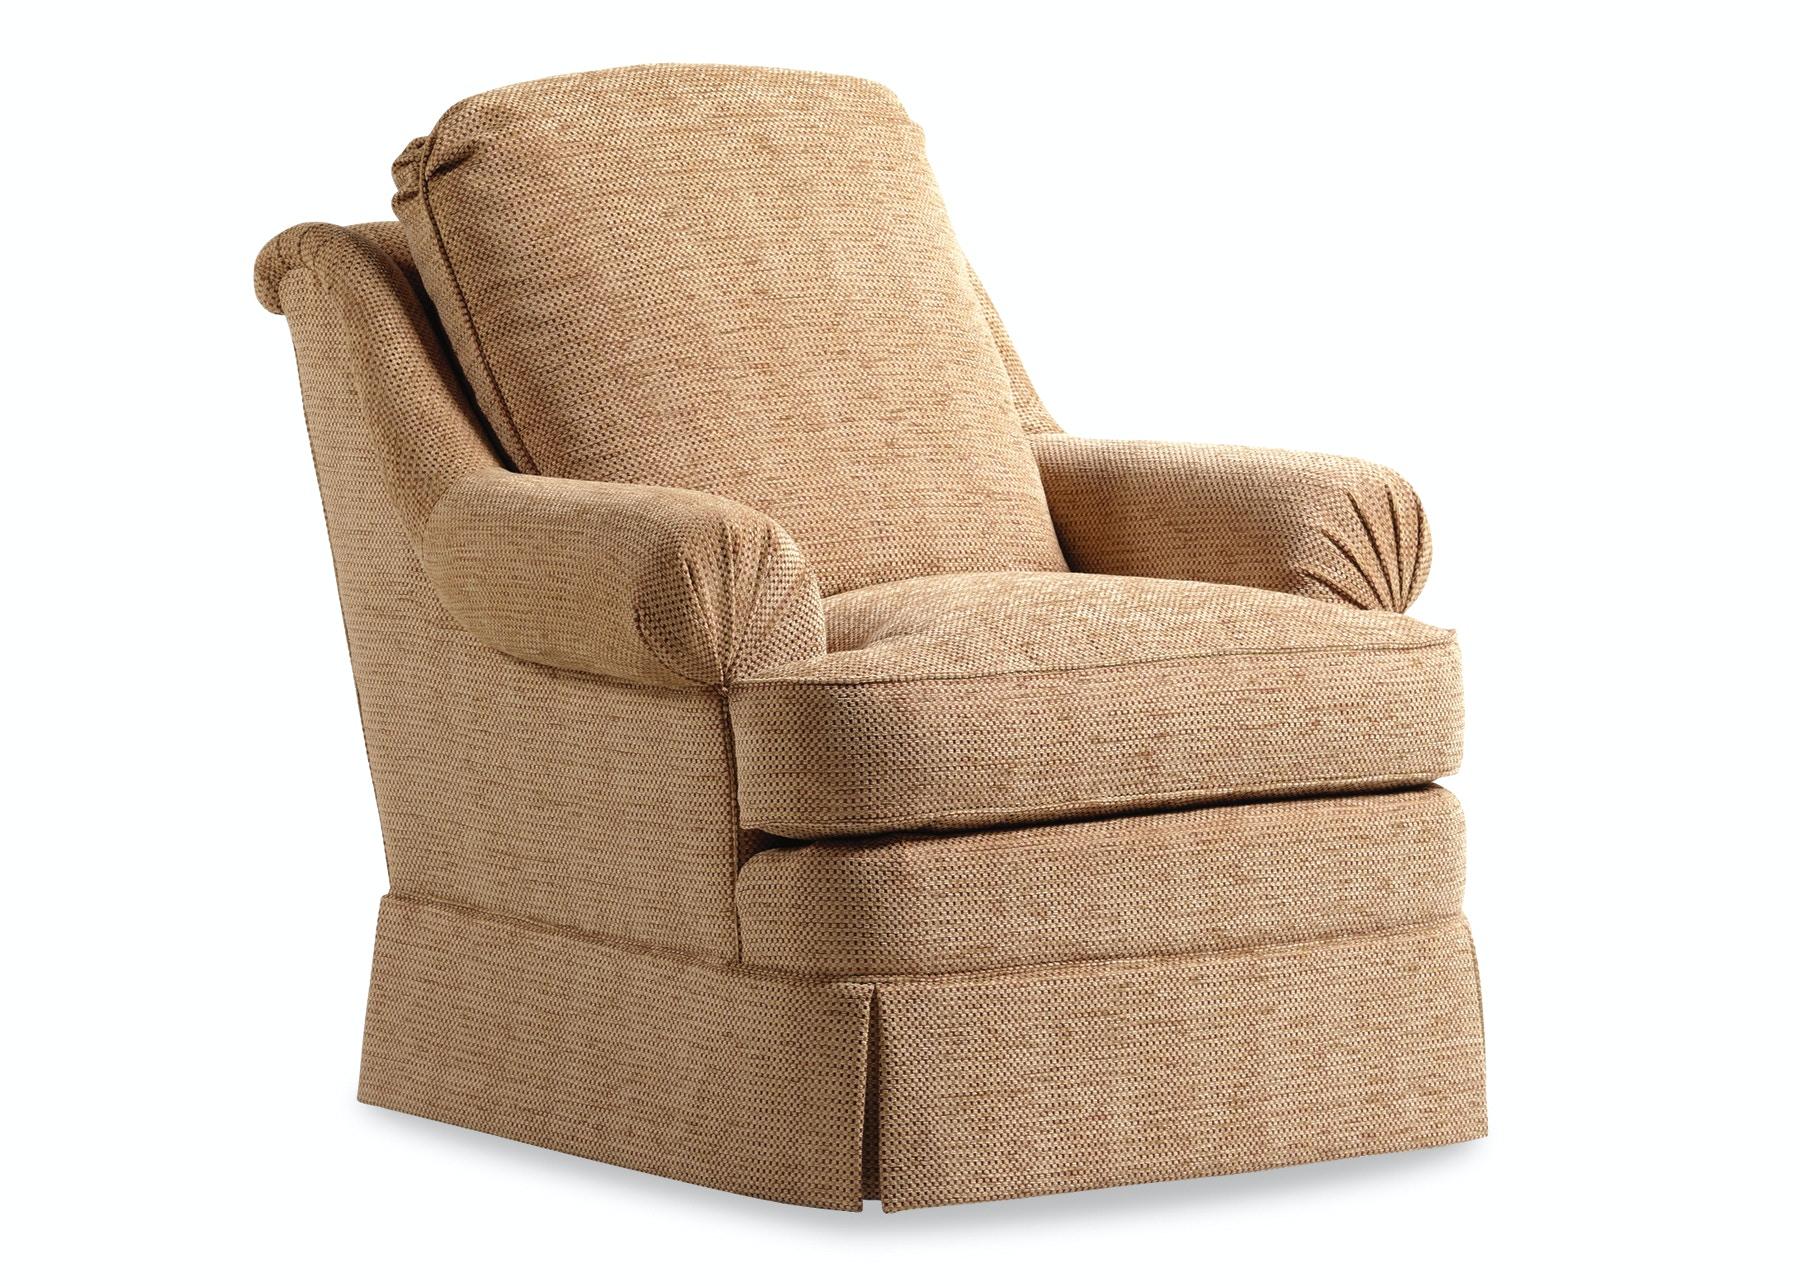 swivel chair quotes walmart and ottoman jessica charles living room fairfield rocker 429 sr